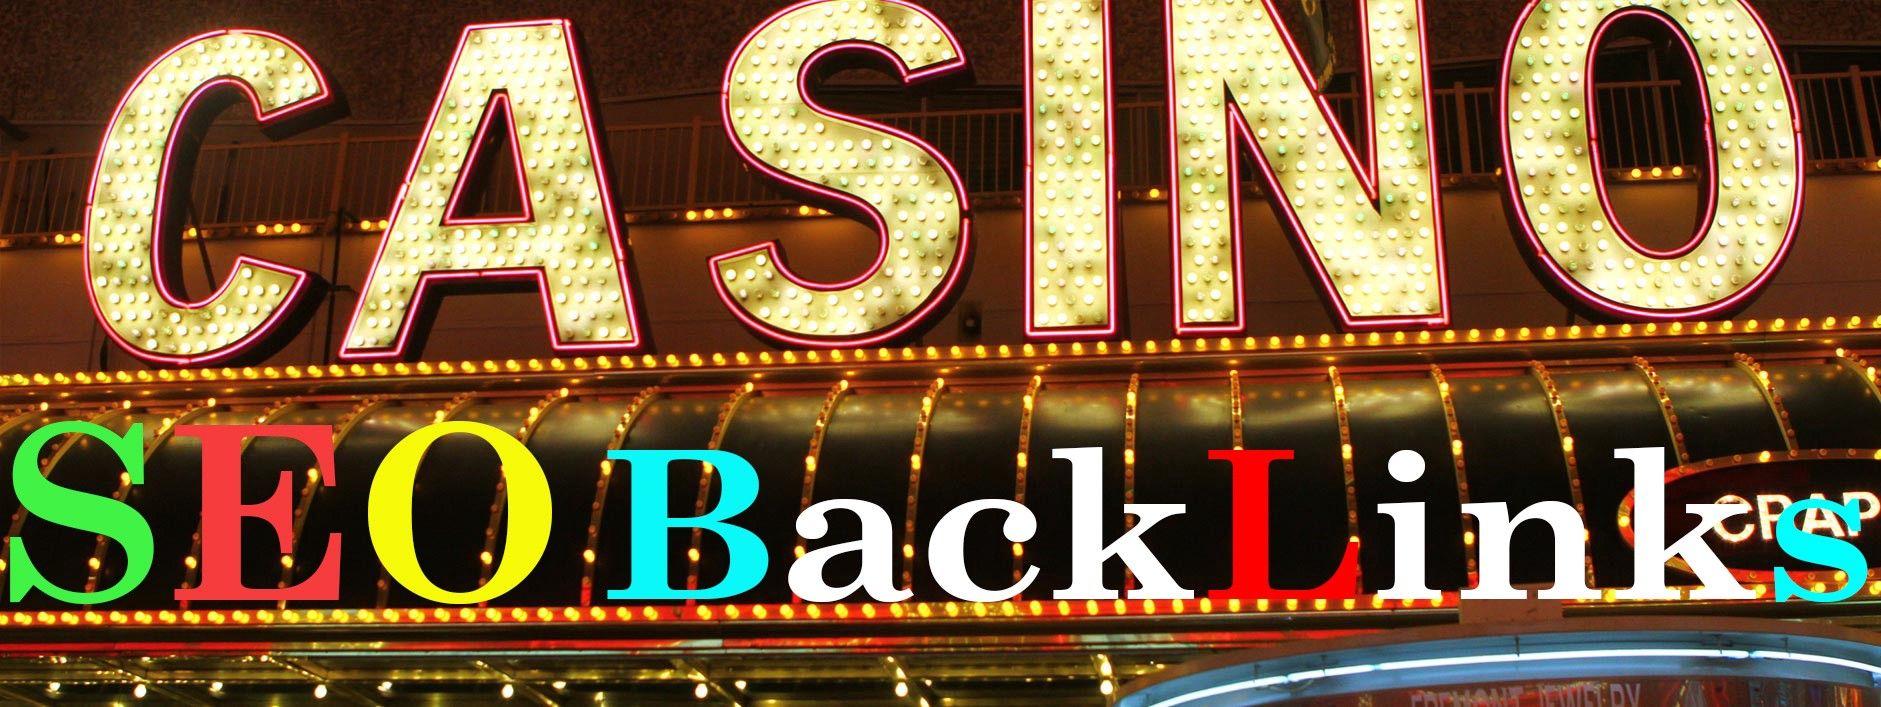 400+ Backlinks for Casino Gambling Poker sports Betting Related Sites